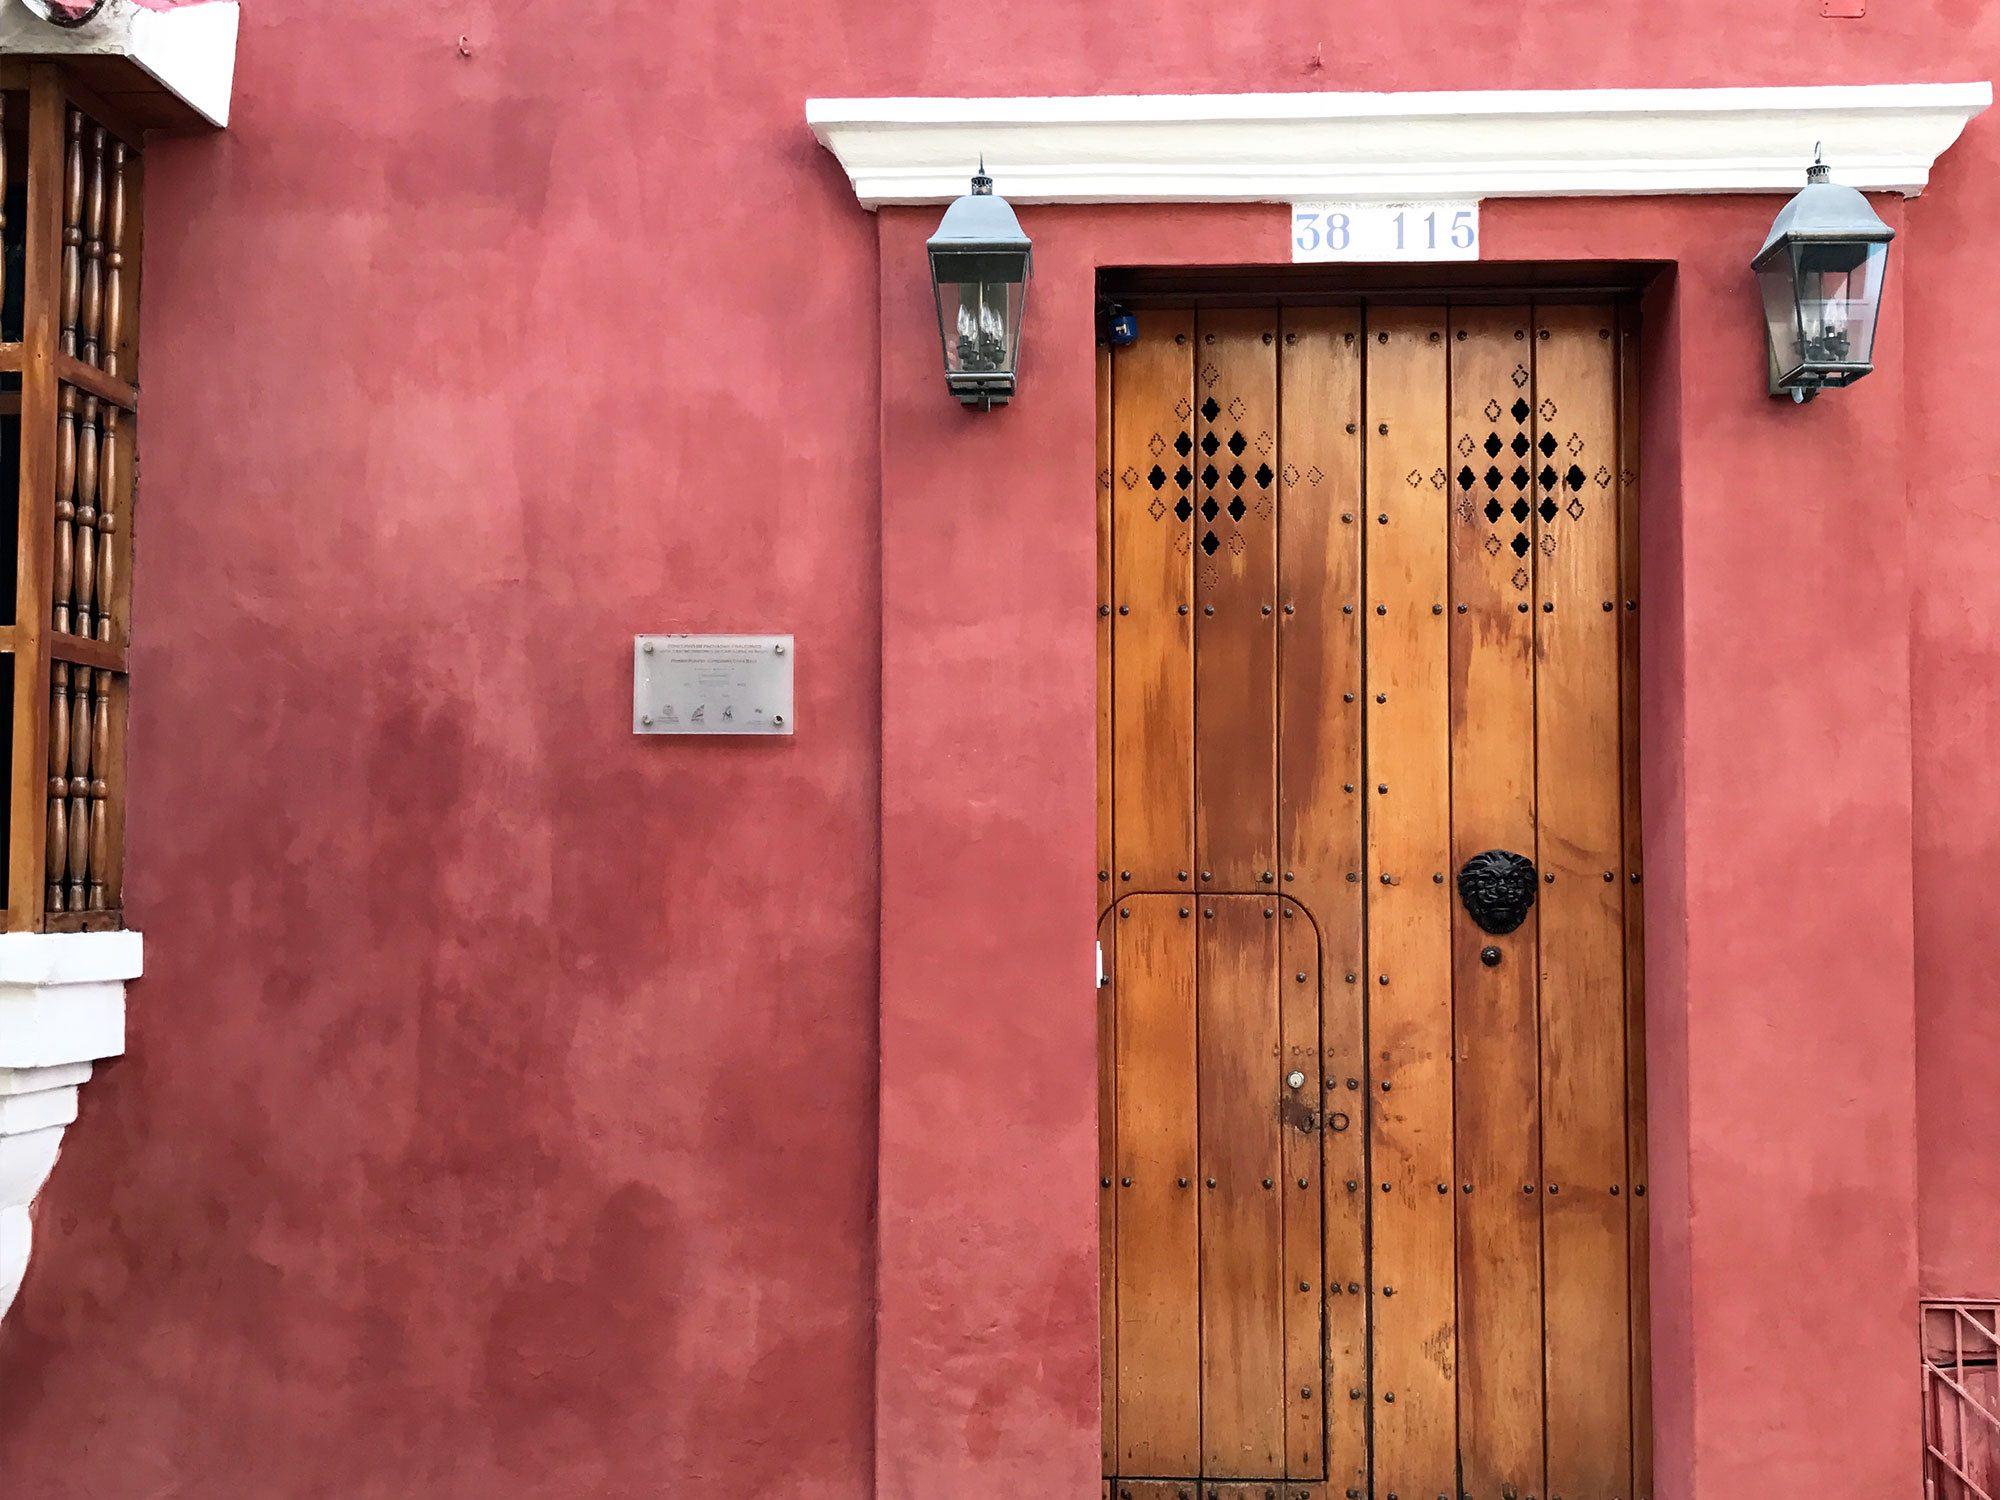 lion door knocker in Cartagena, Colombia  | pictures of Cartagena, Colombia